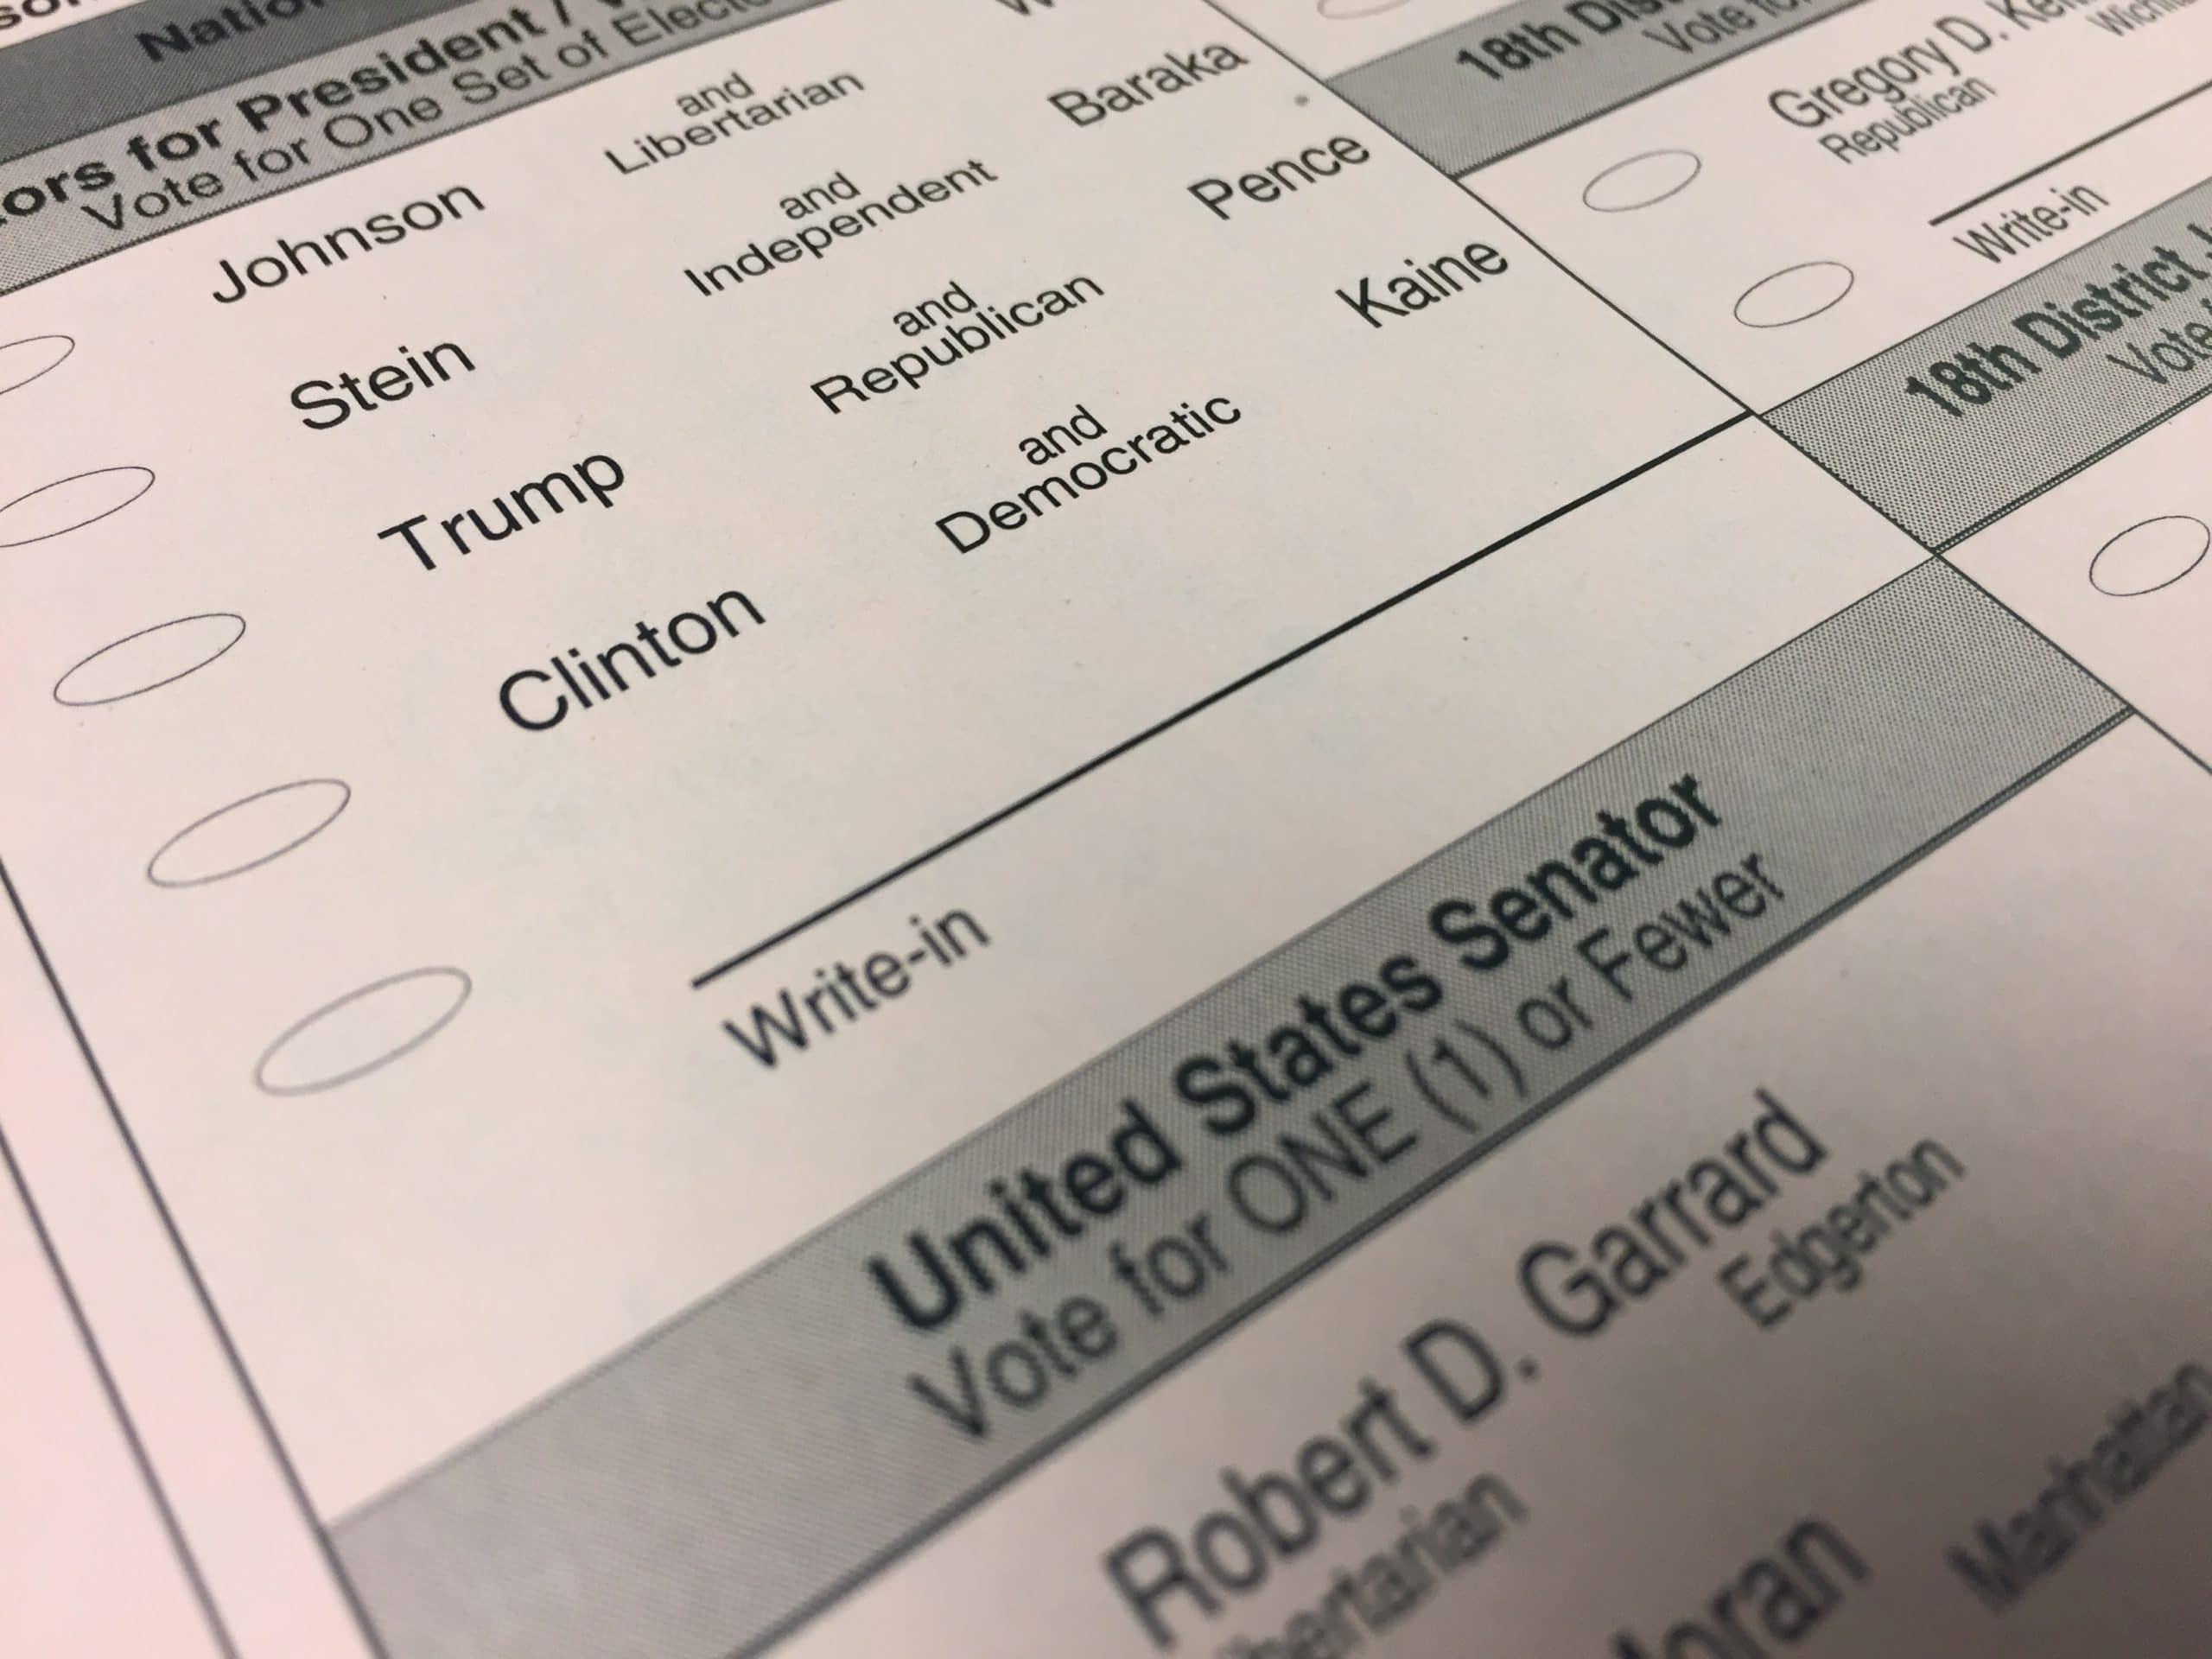 write-in-candidate-scaled.jpg